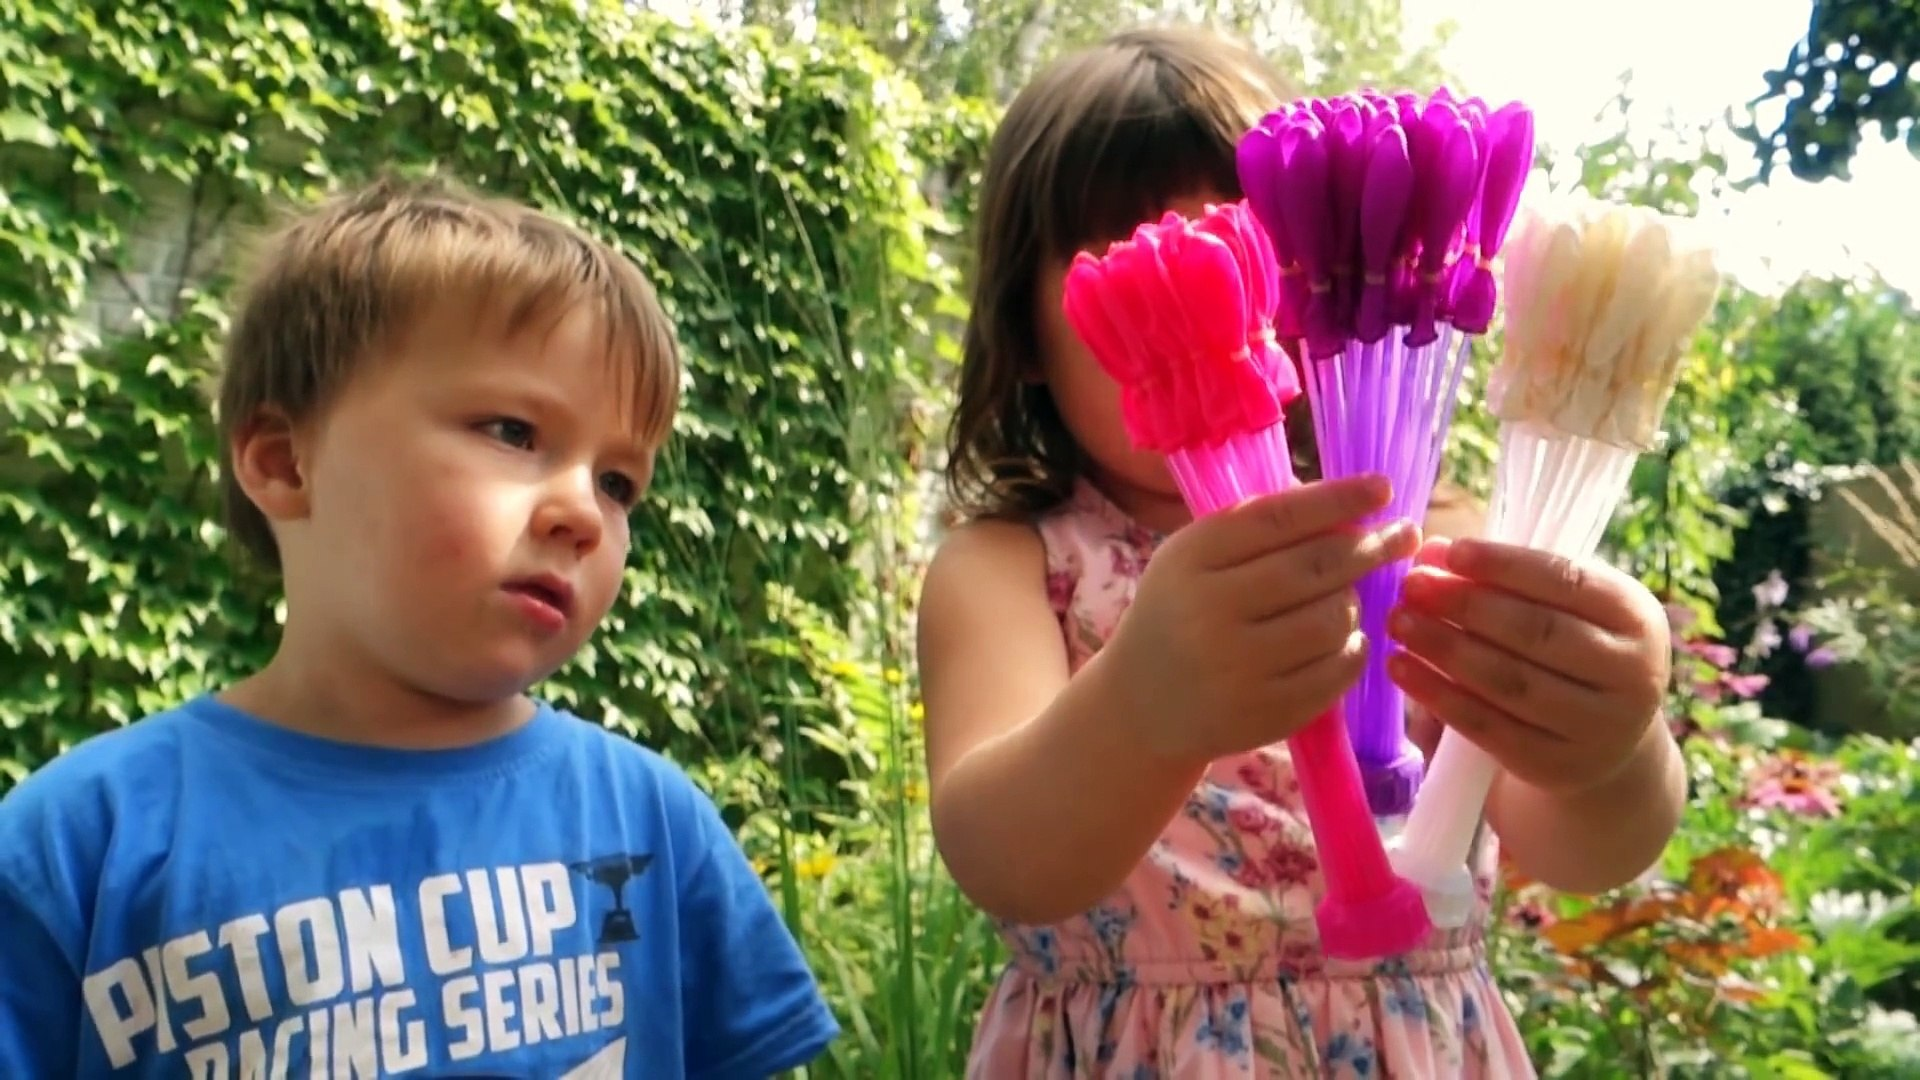 Kids ELSA vs. WATER BALLOONS Activities Kids Videos Fun Balloons and Toys